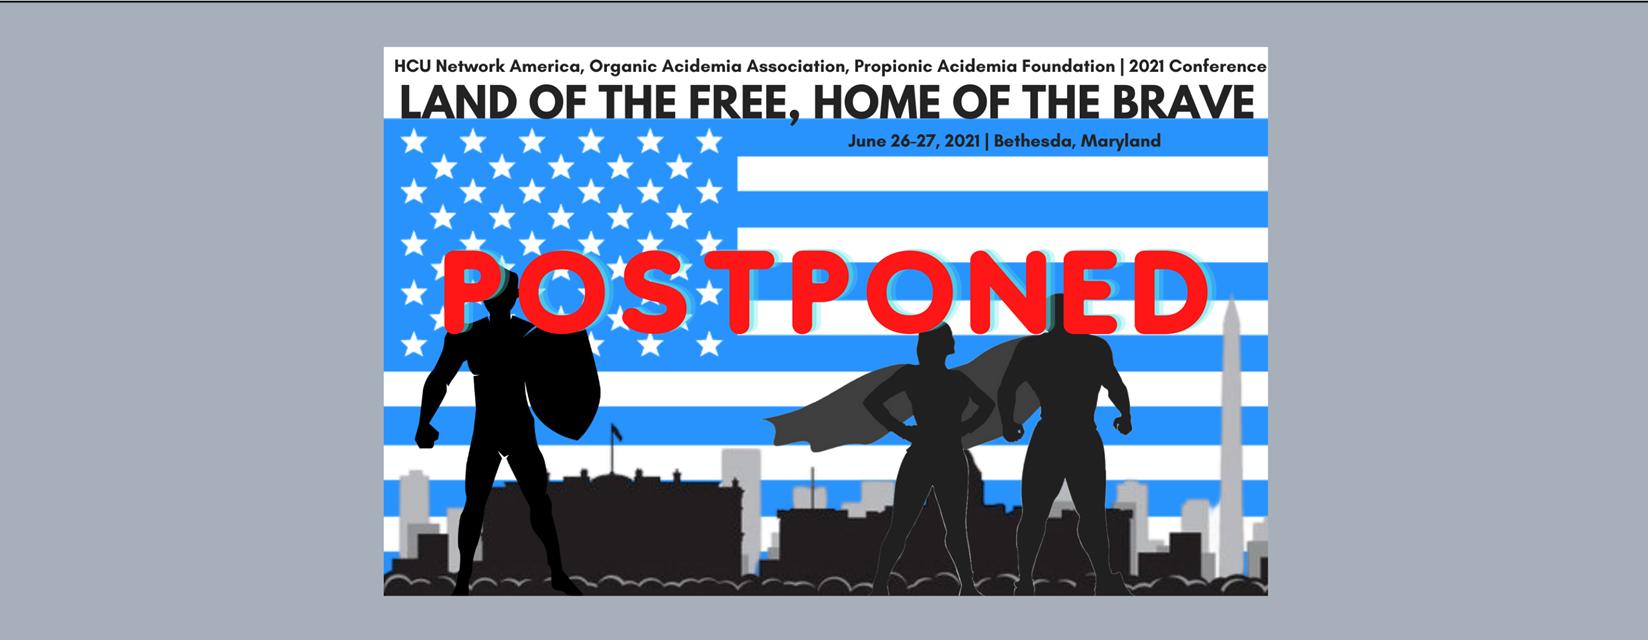 website-banner-postponed-horizontal